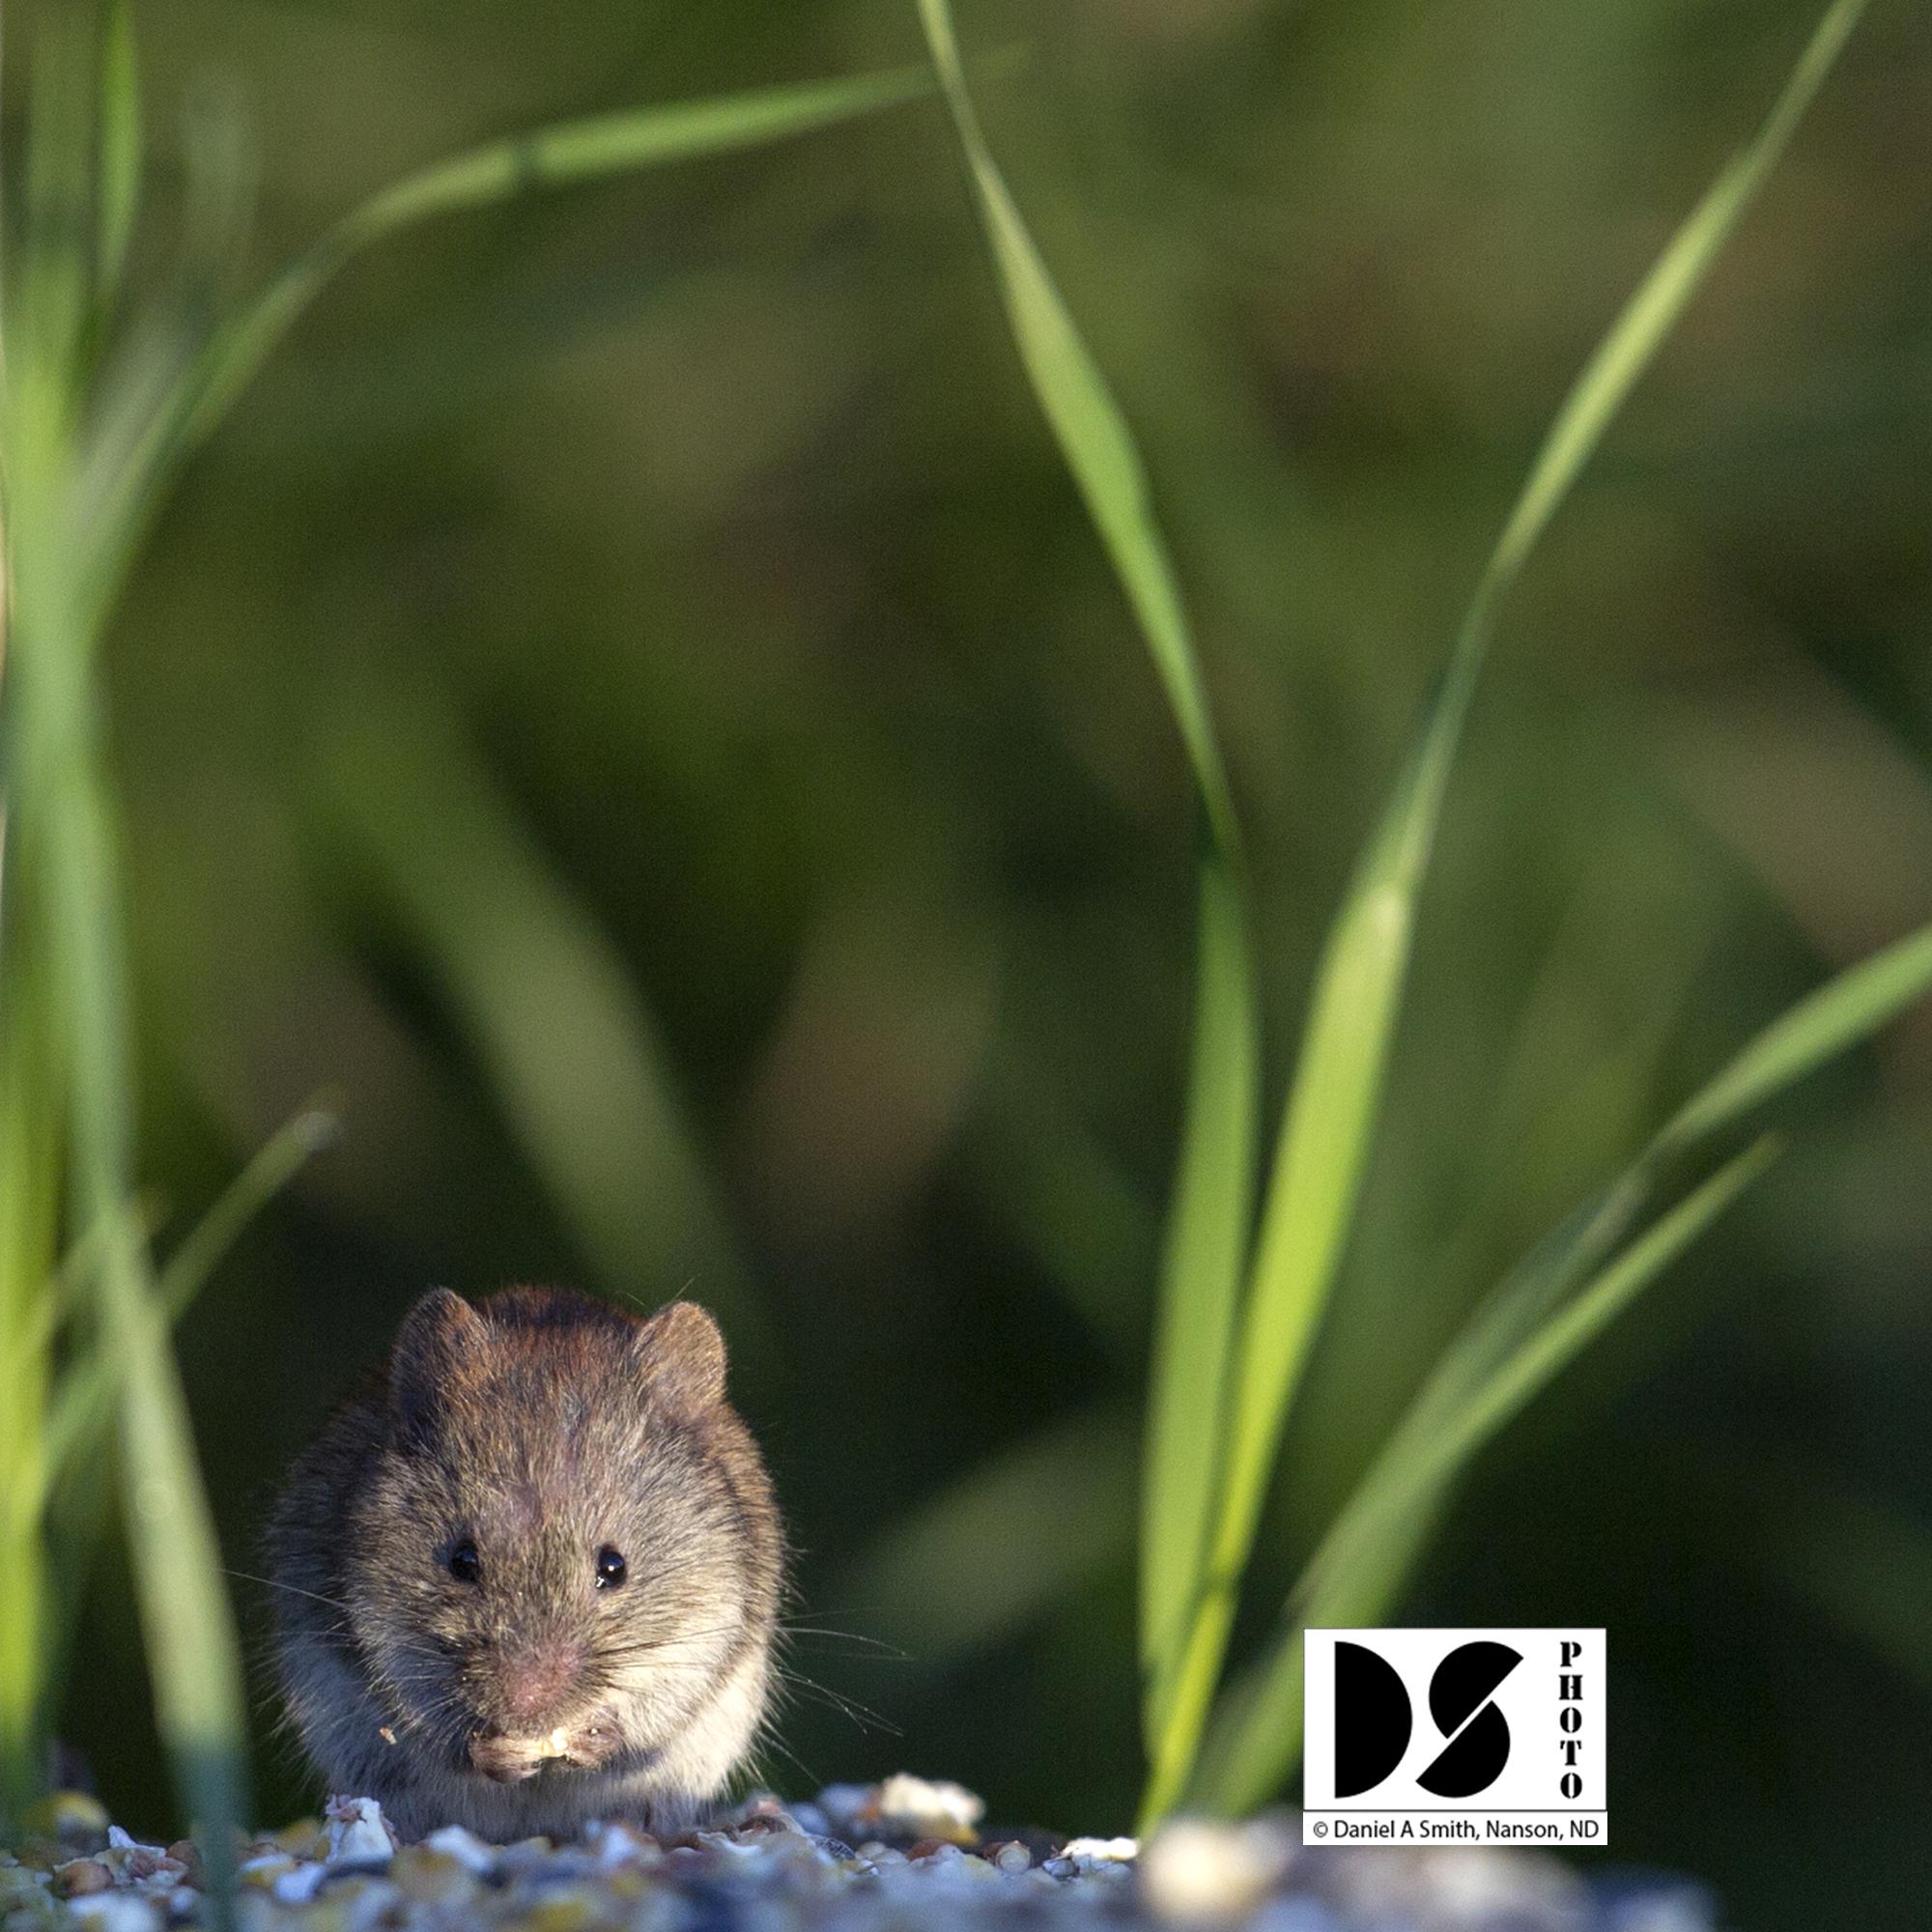 © 2020 Daniel A Smith, Field mouse feeding on spilled grain